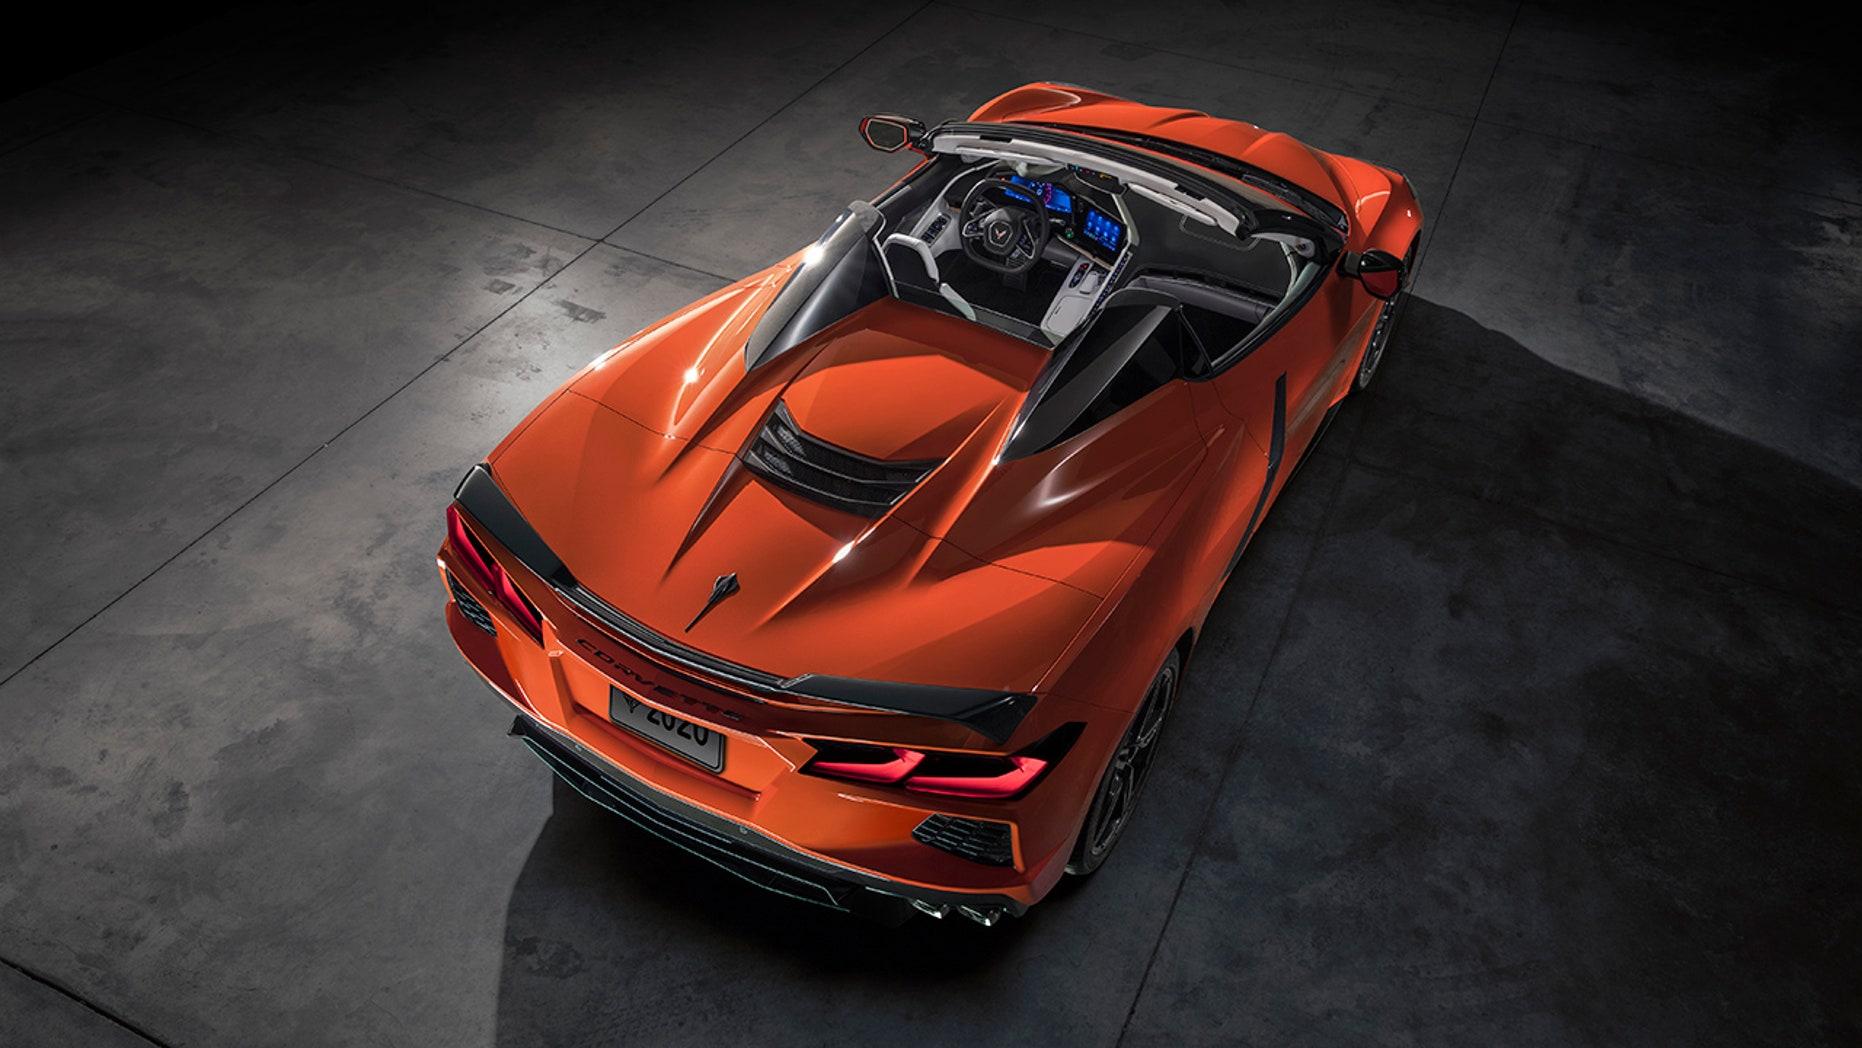 2020 Chevrolt Corvette Stingray convertible